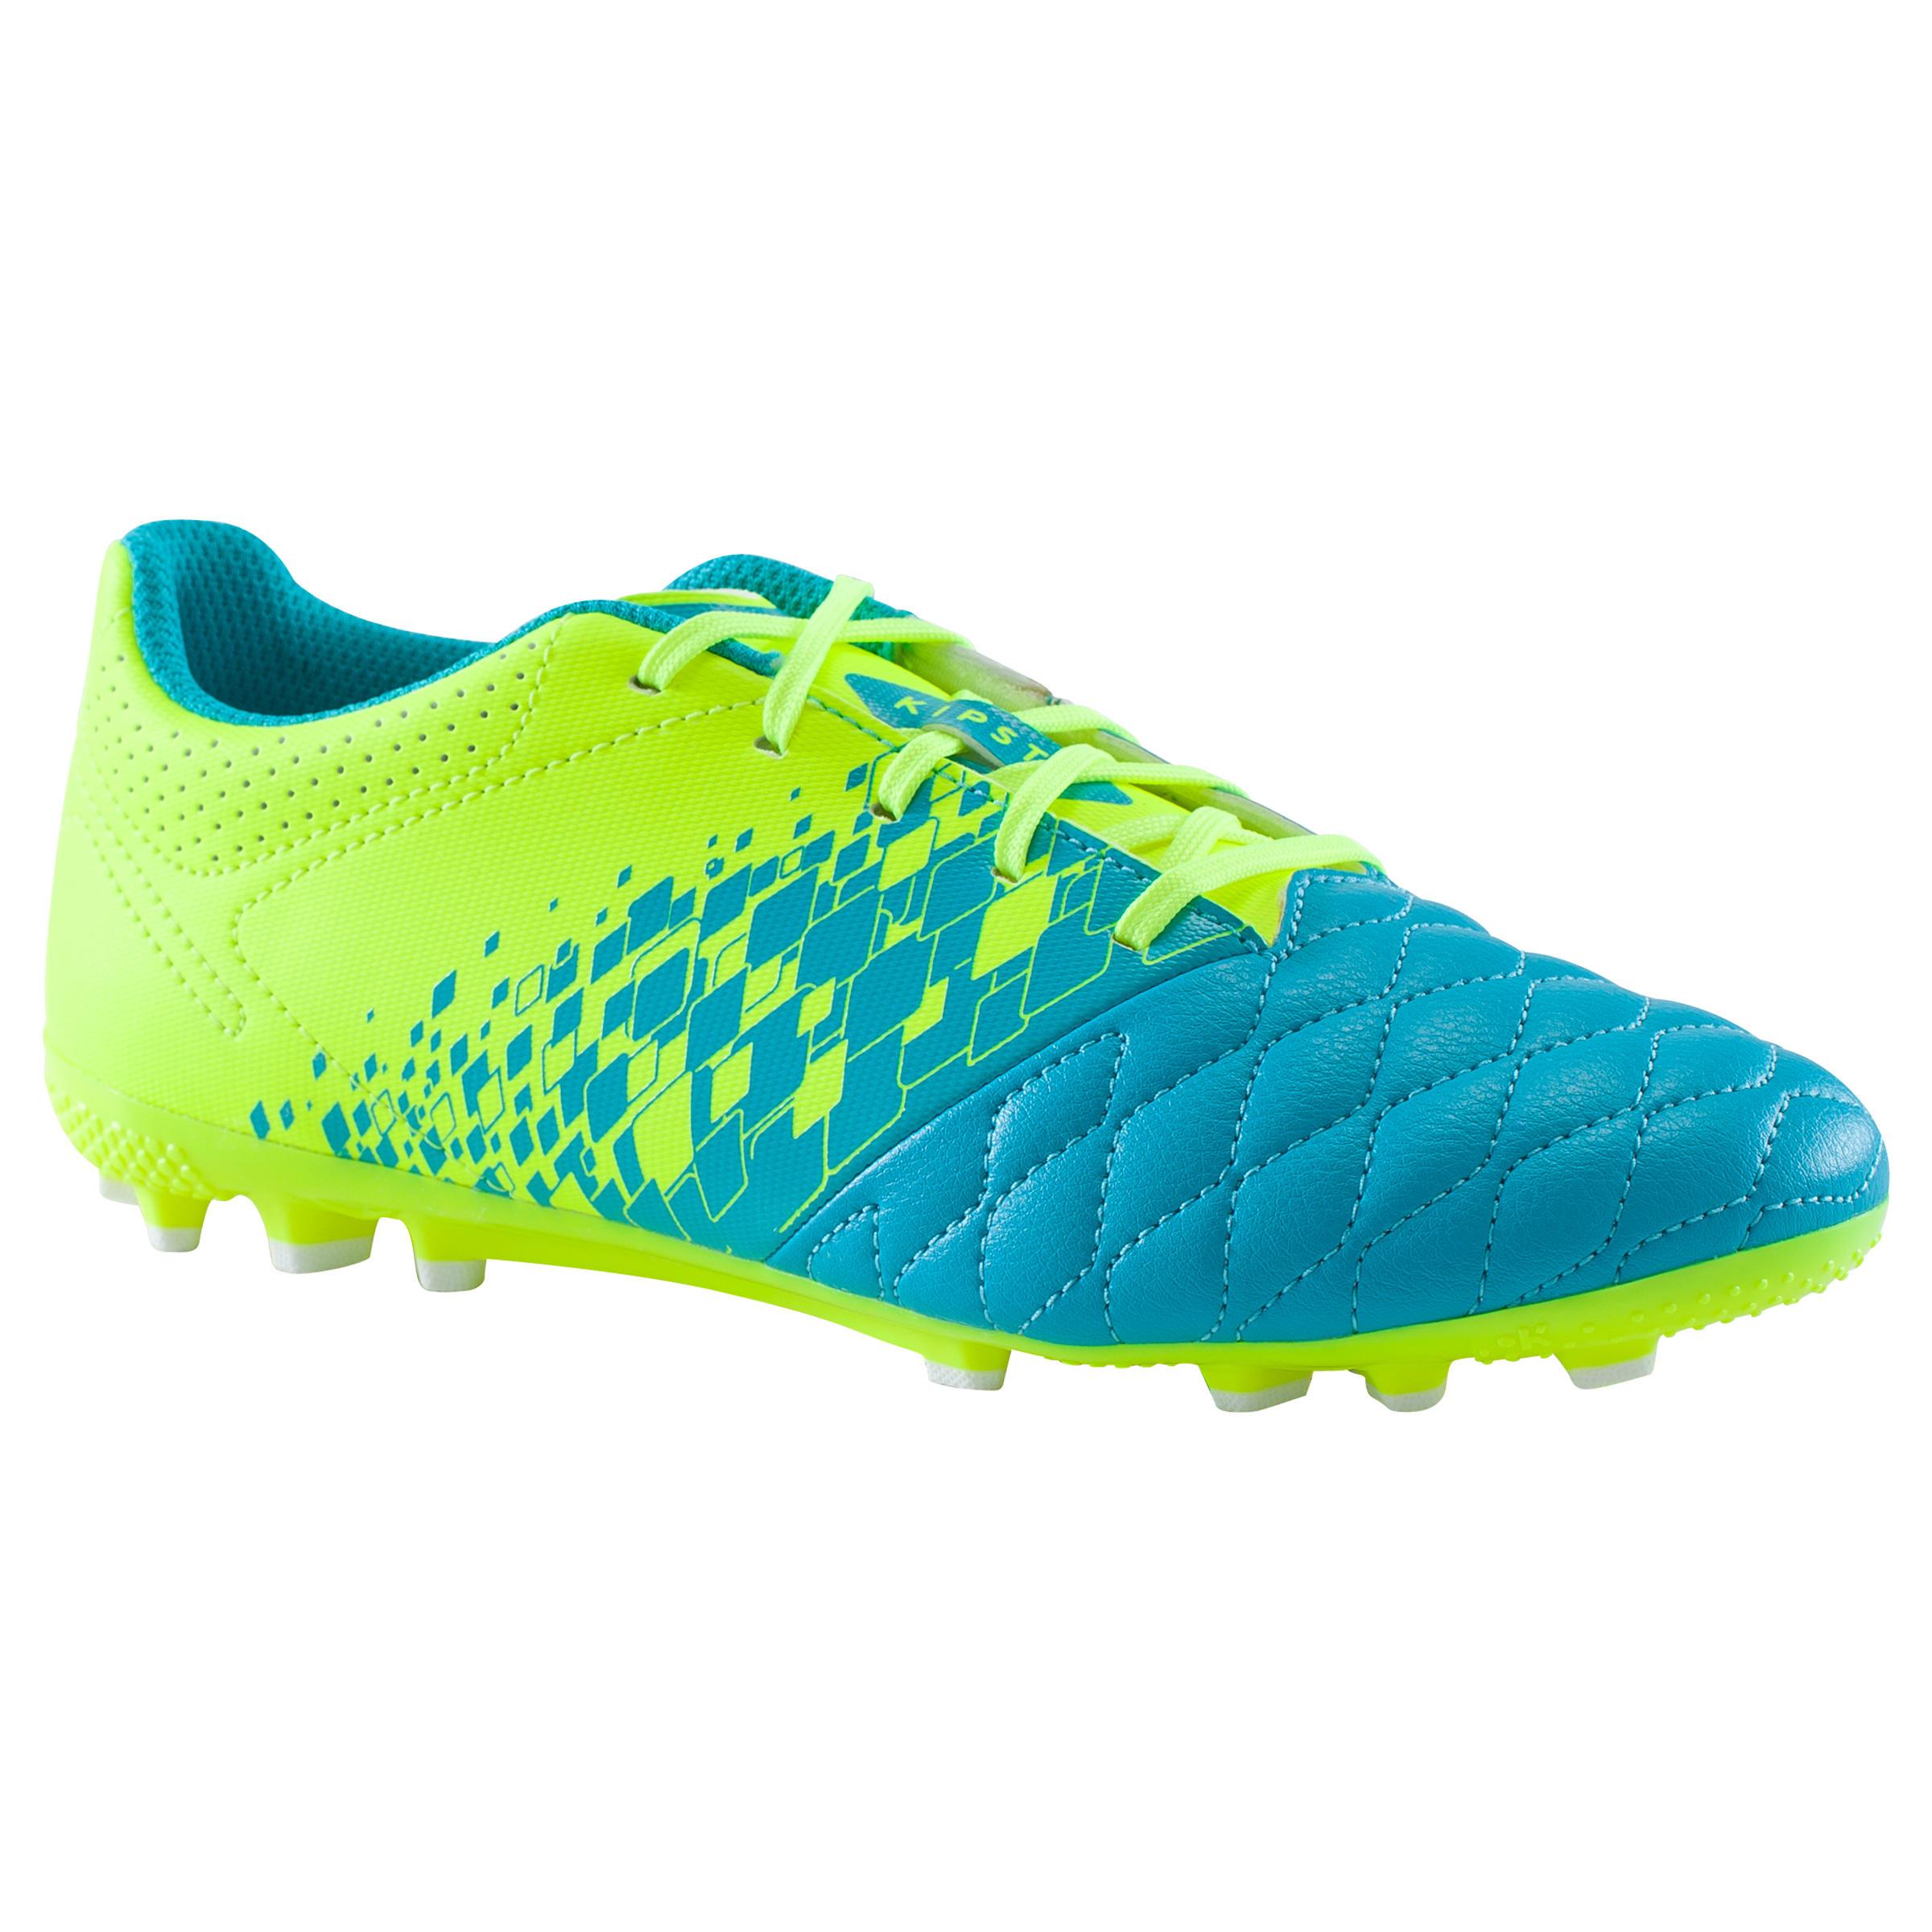 Kids' Football Boots Agility 500 AG - Blue/Yellow